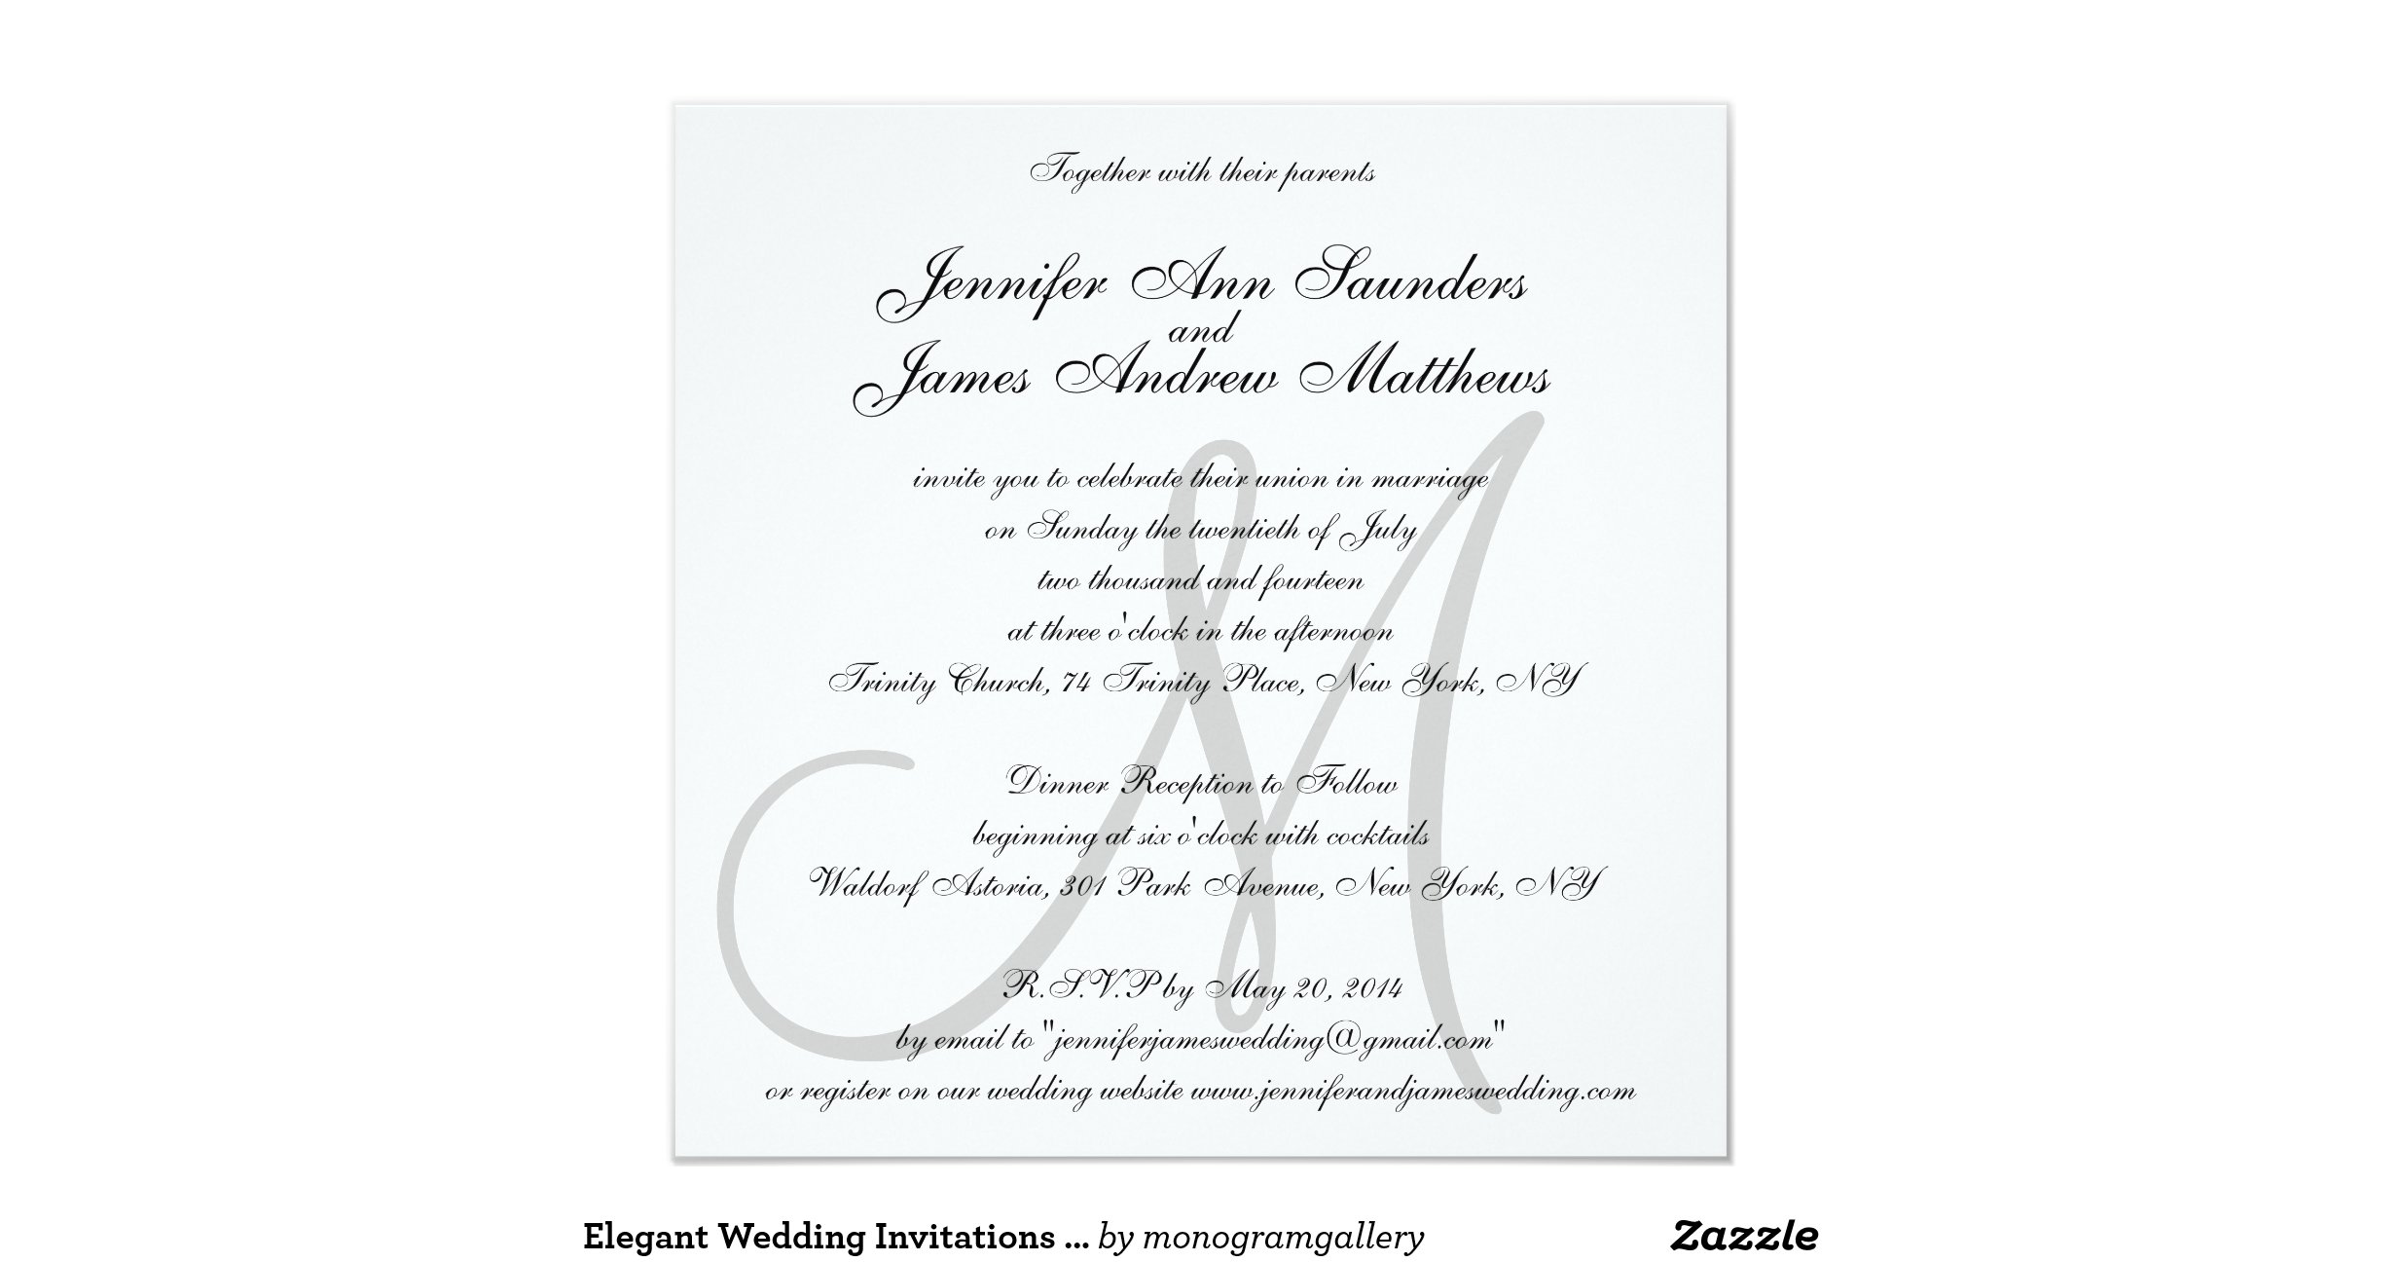 Initial Wedding Invitations: Elegant_wedding_invitations_monogram_initial_names